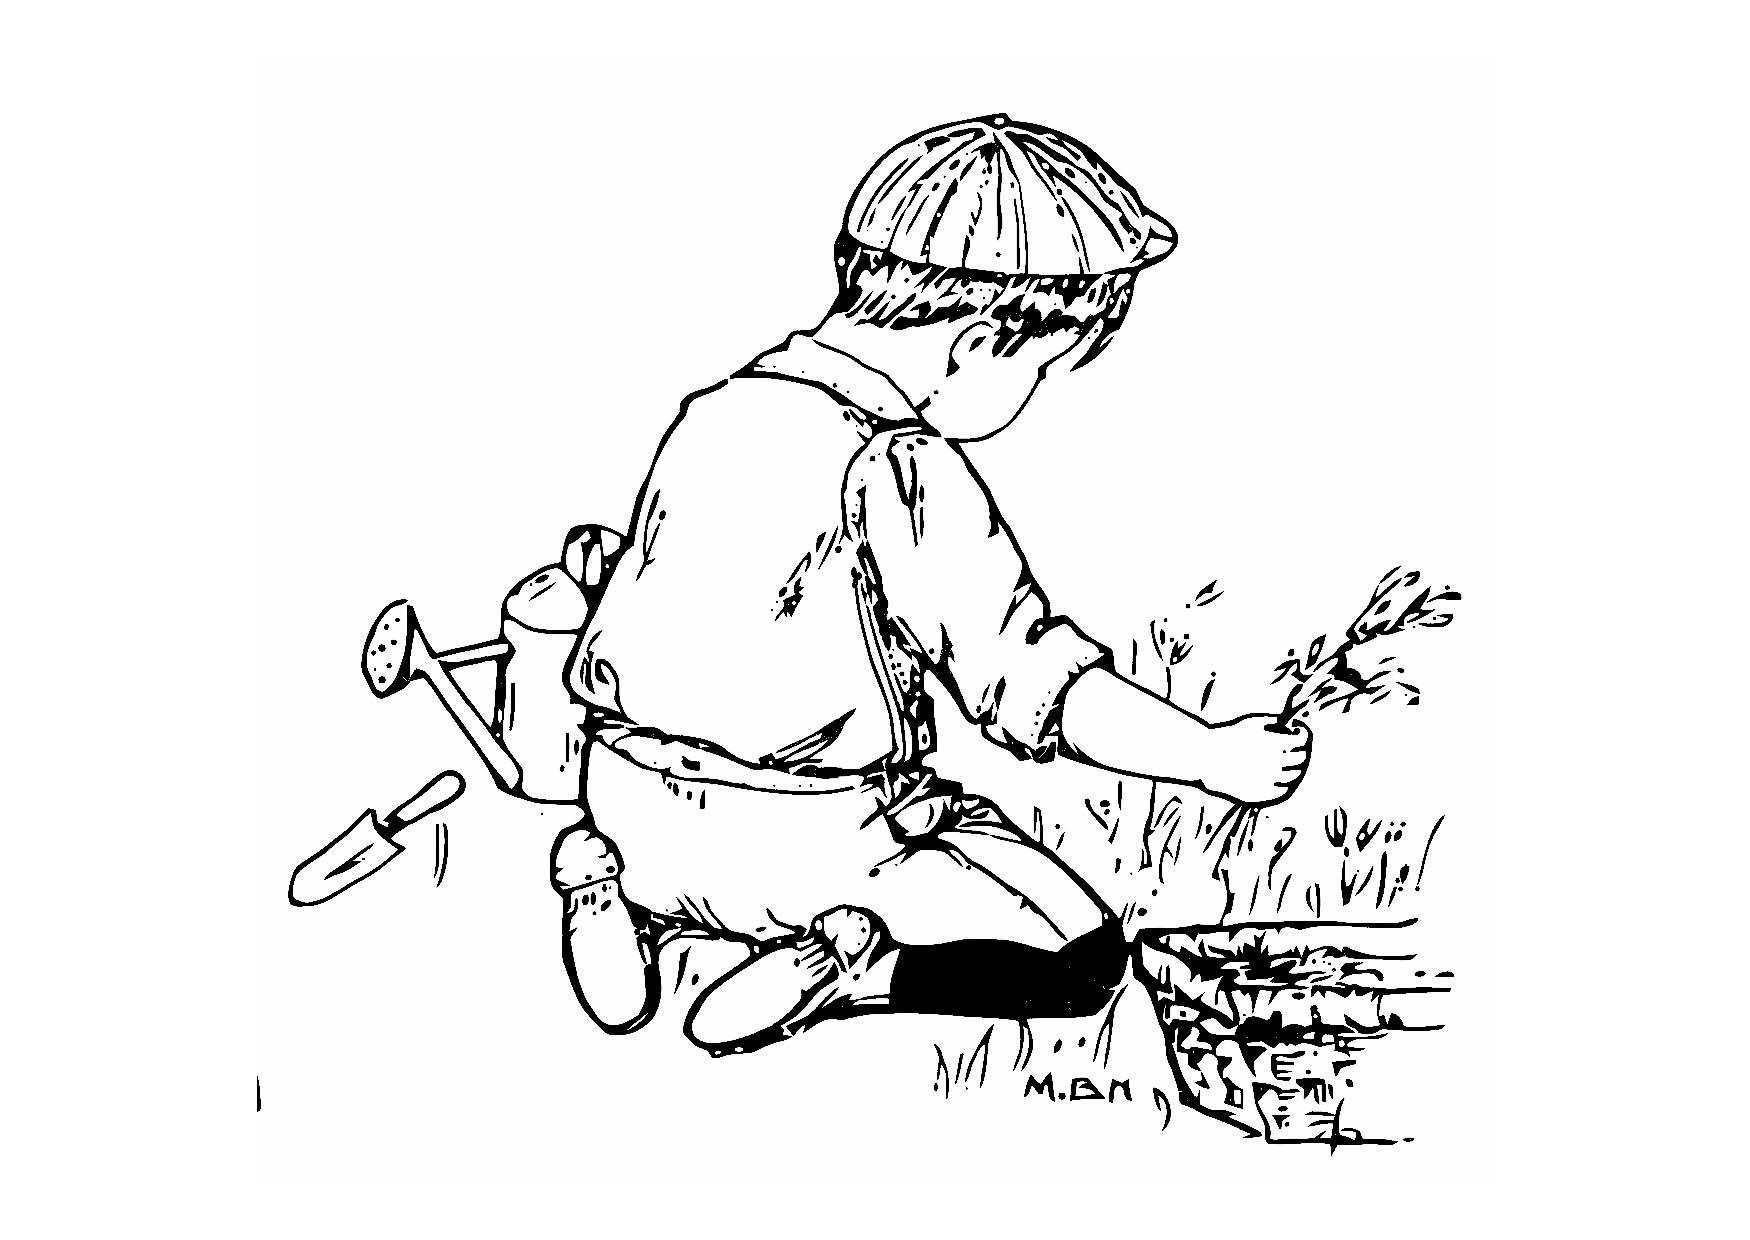 Dibujo para colorear ni o en el jard n img 11435 for Jardin dibujo